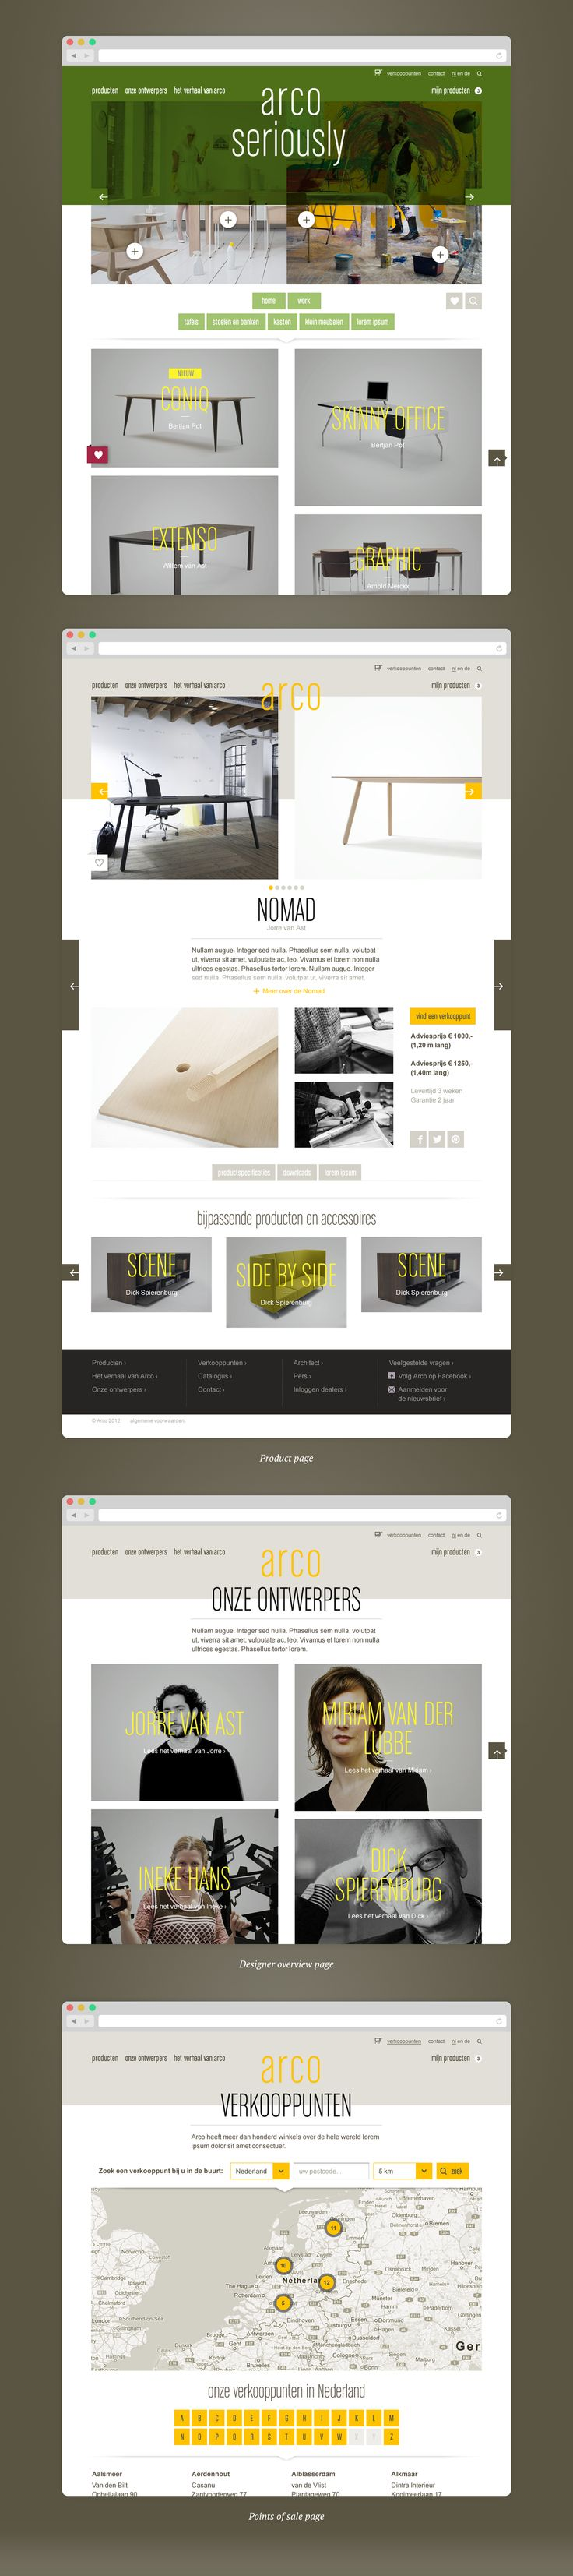 Arco.nl - Portfolio of Sanne Wijbenga #Webdesign #UI